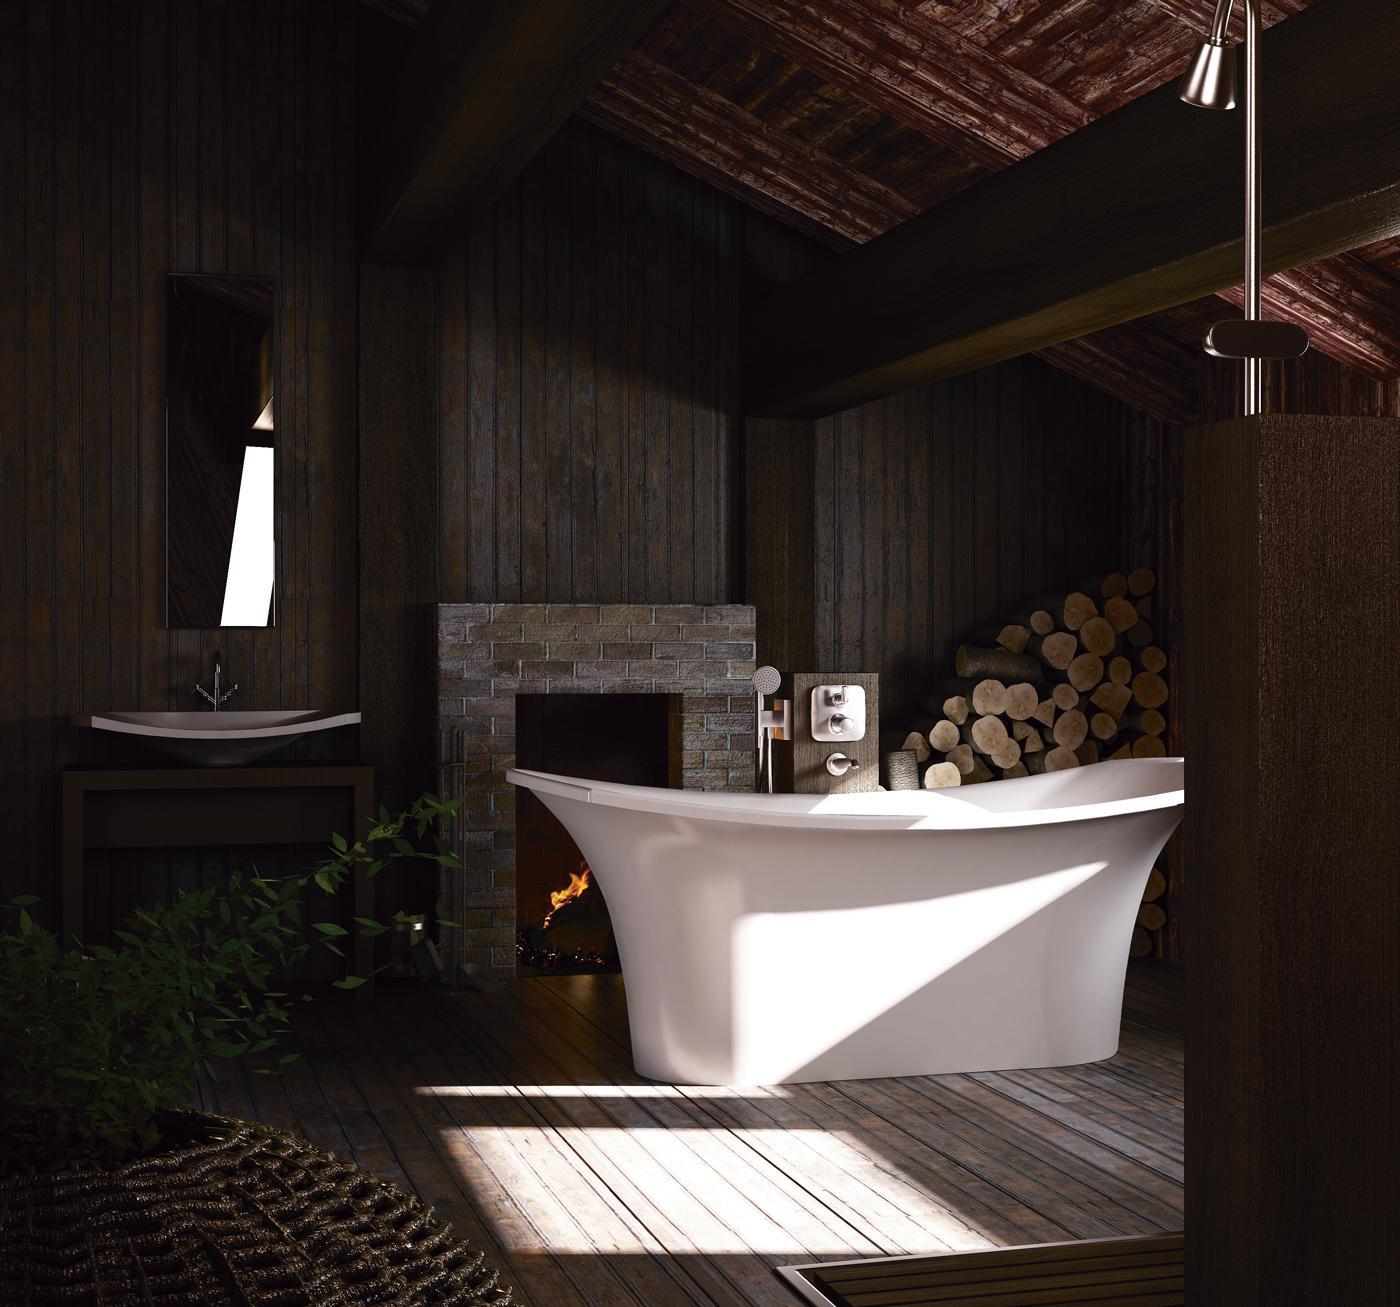 Латвийская ванна из камня PAA коллекция BEL CANTO